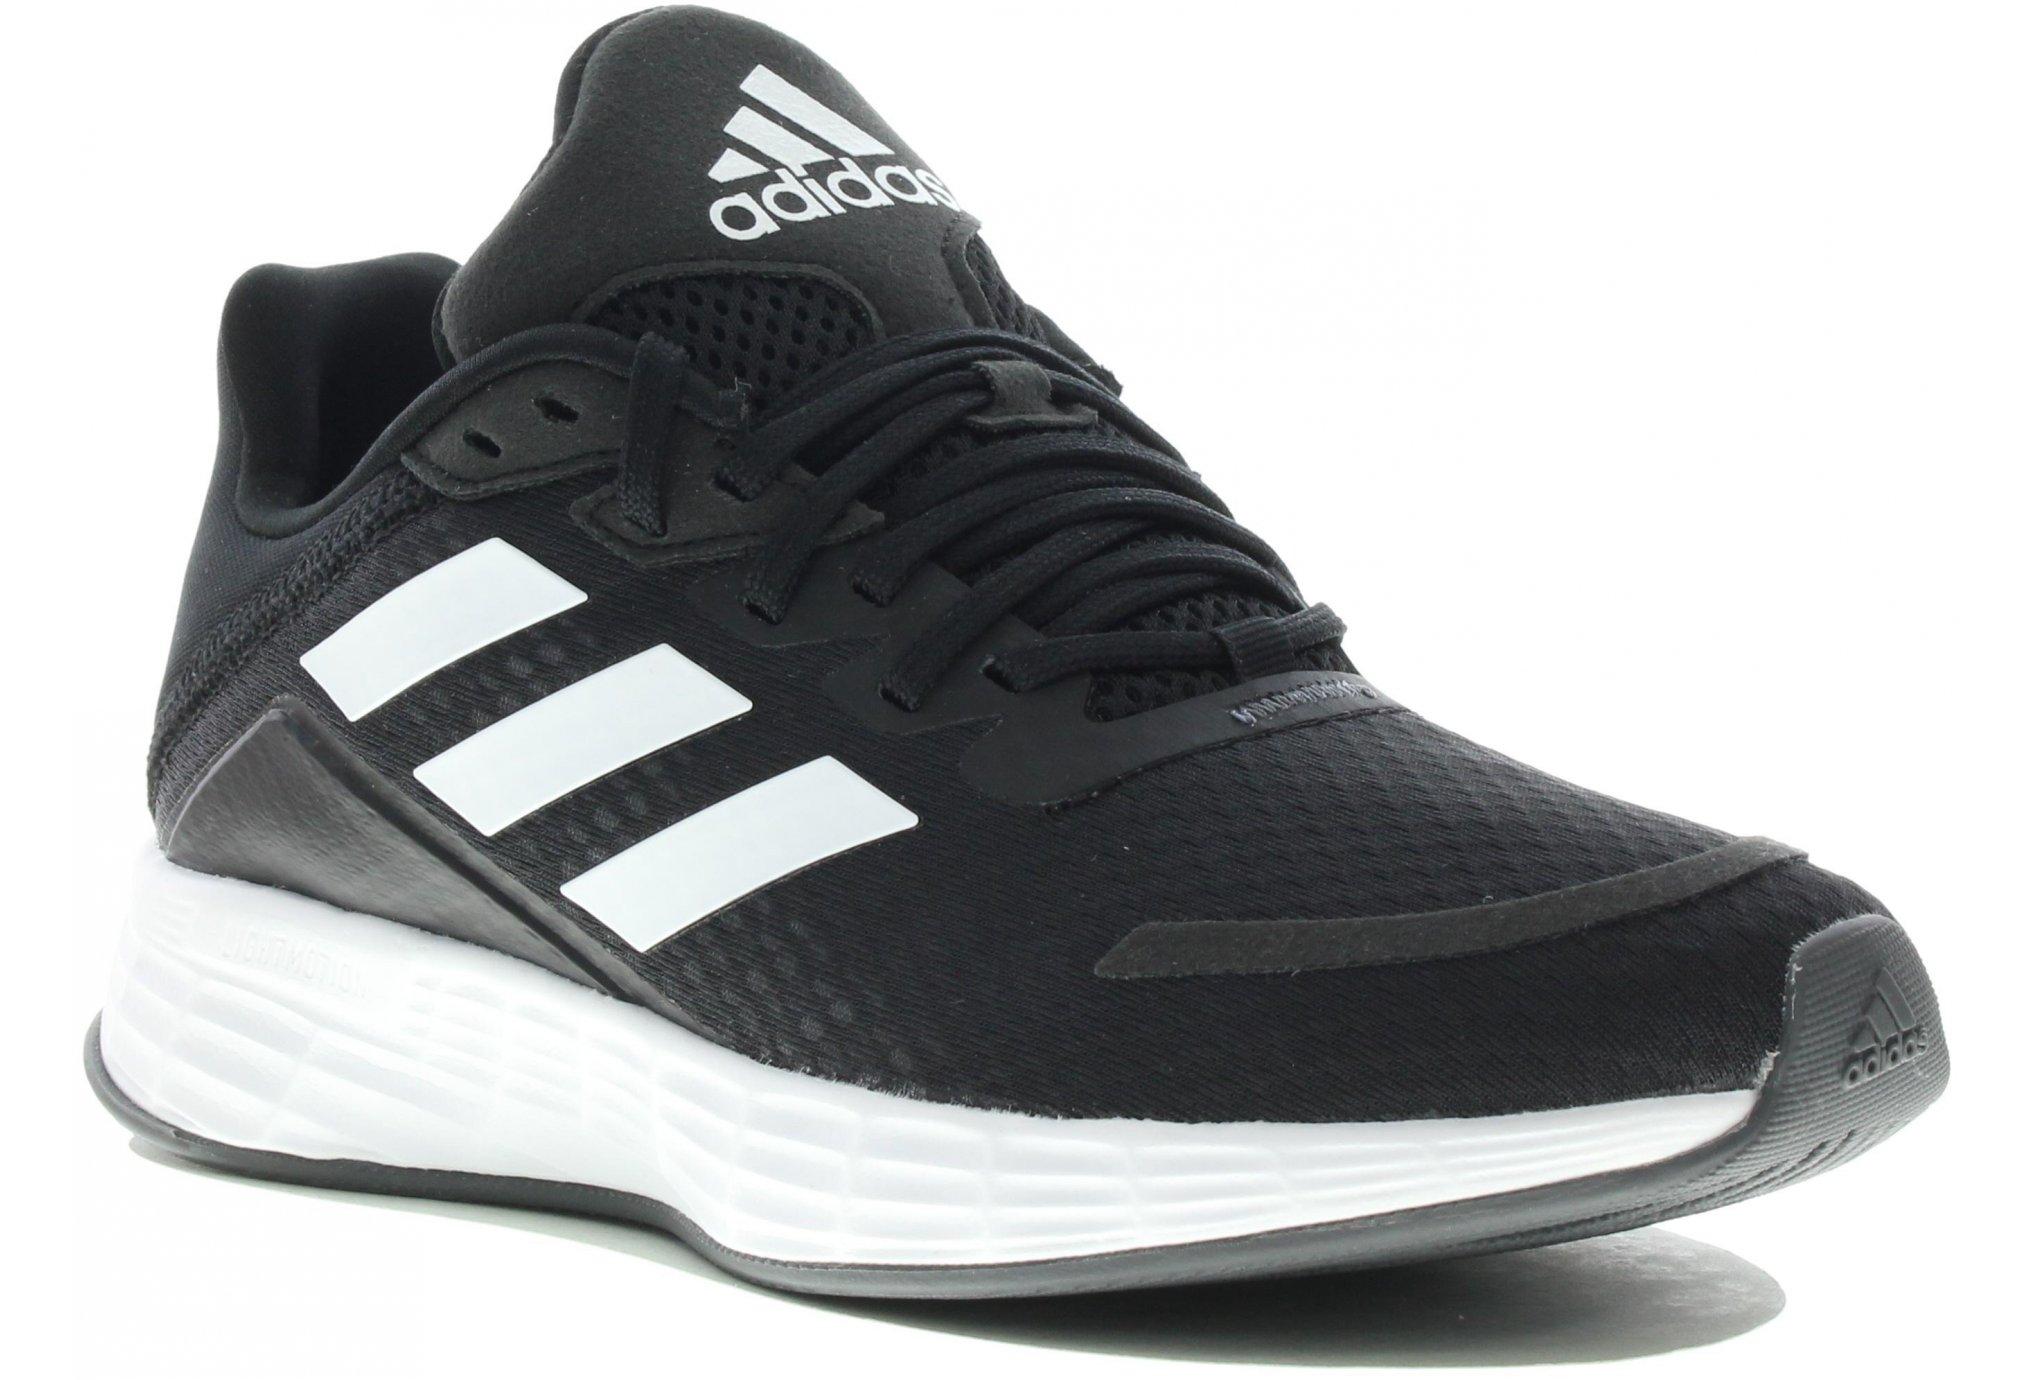 adidas Duramo SL Junior Chaussures homme